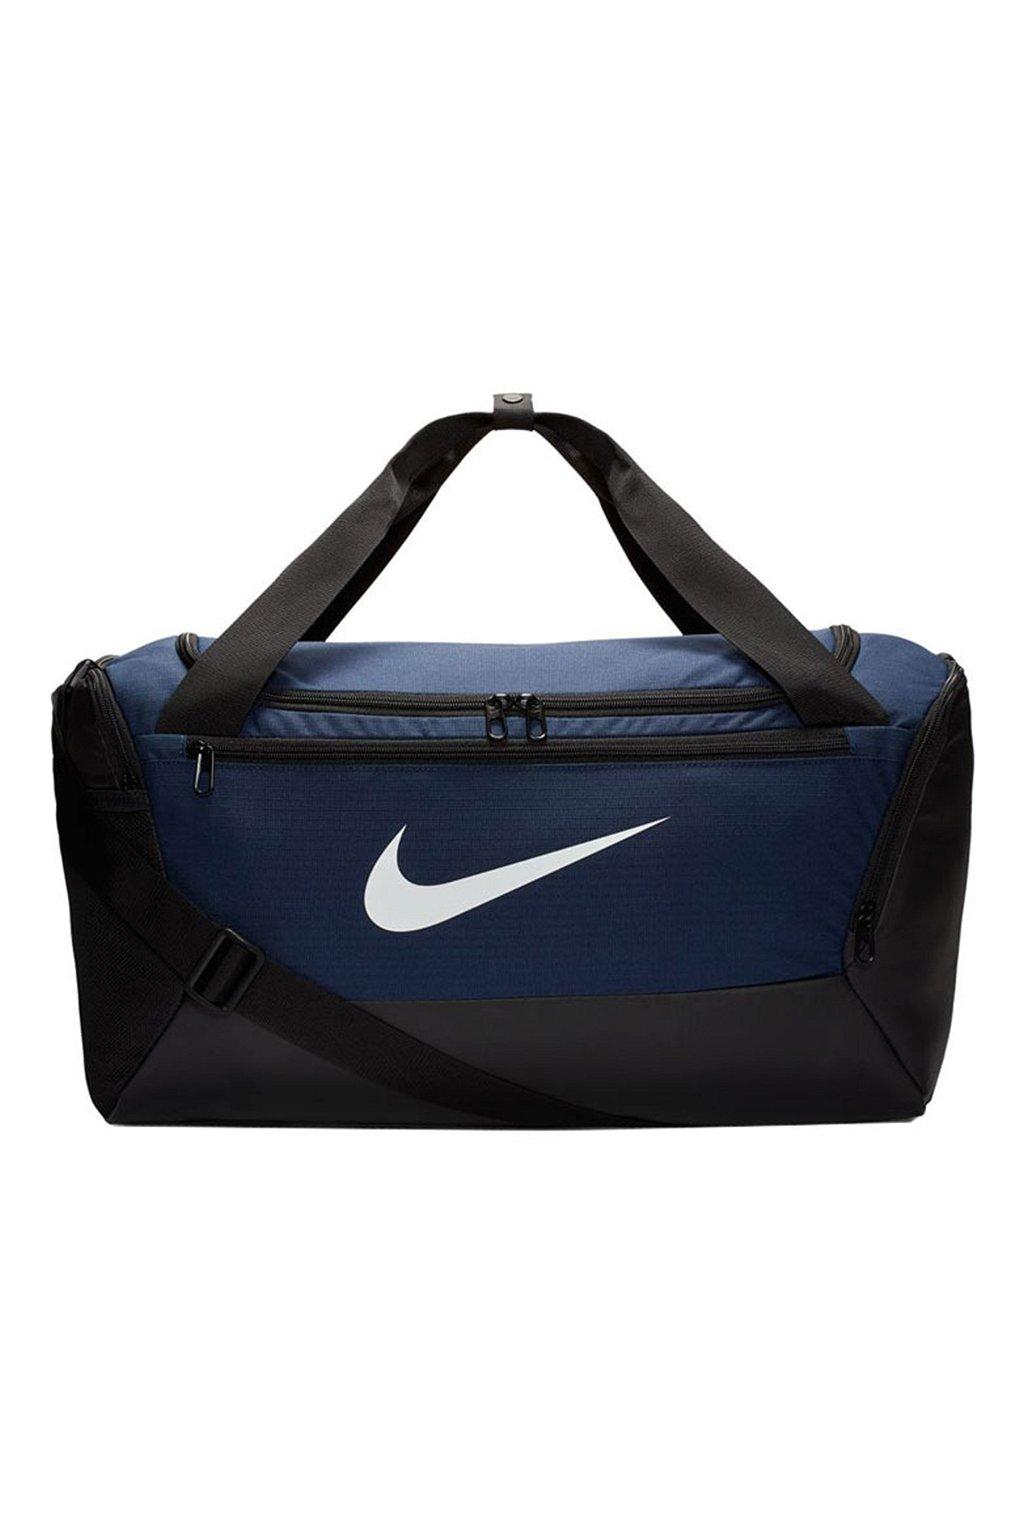 Taška Nike Brasilia S Duffel 9.0 tmavo modrá BA5957 410